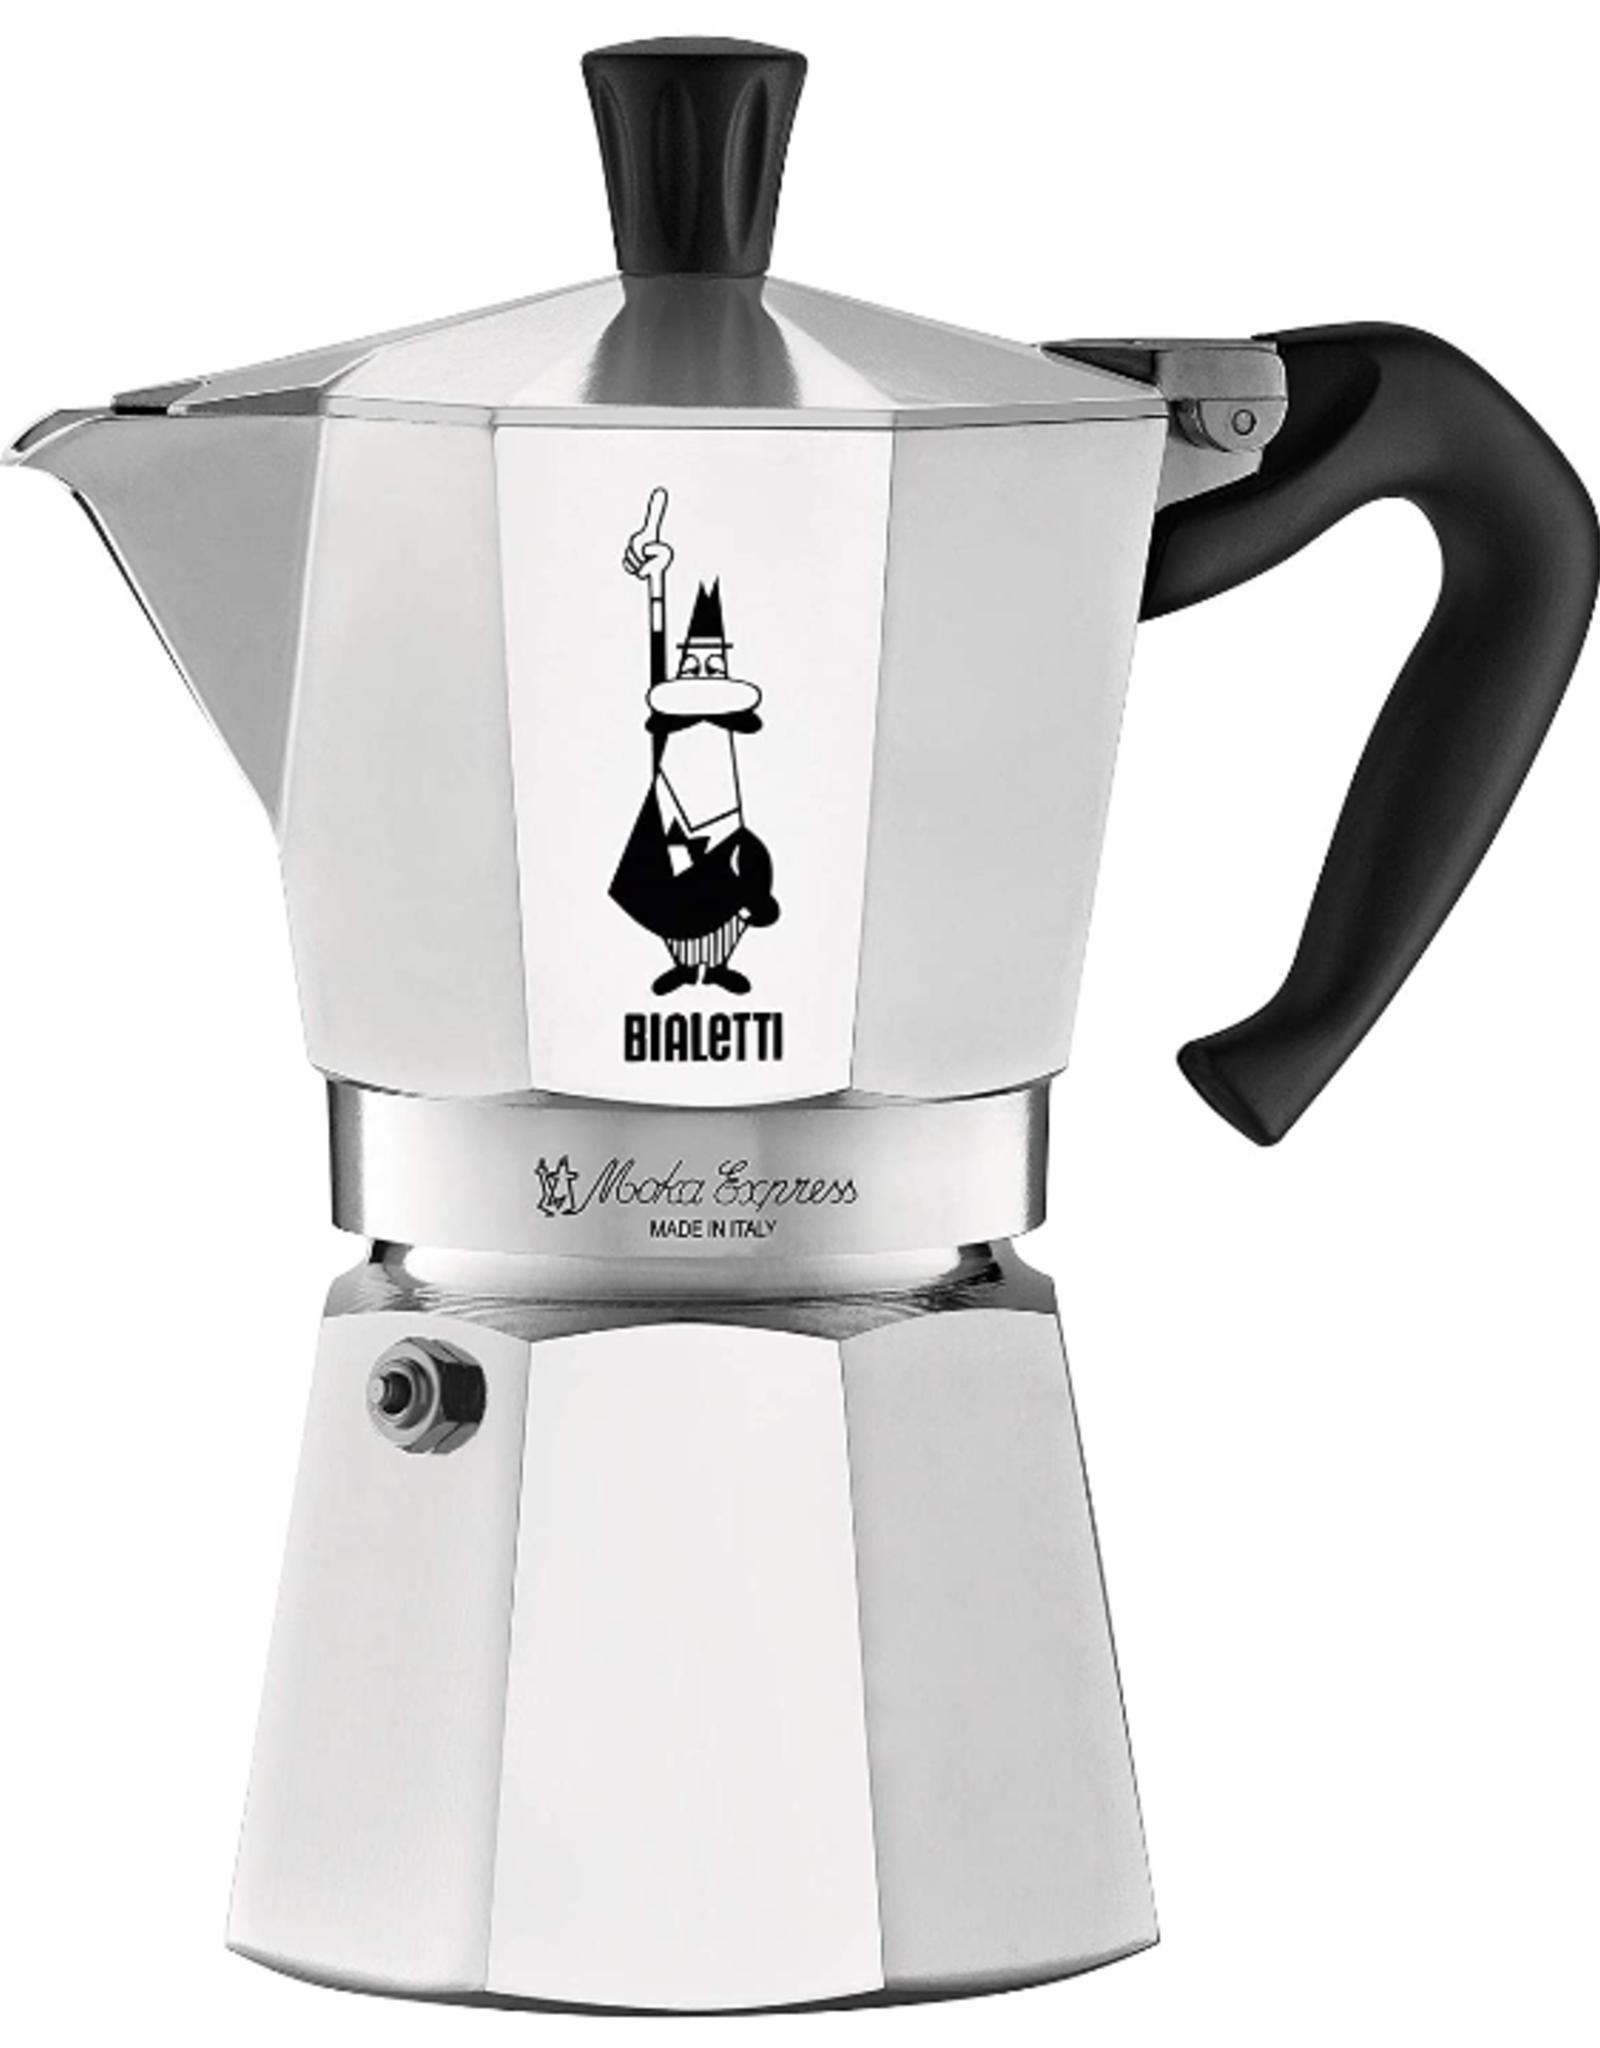 Bialetti Bialetti Moka Express, 6 cups